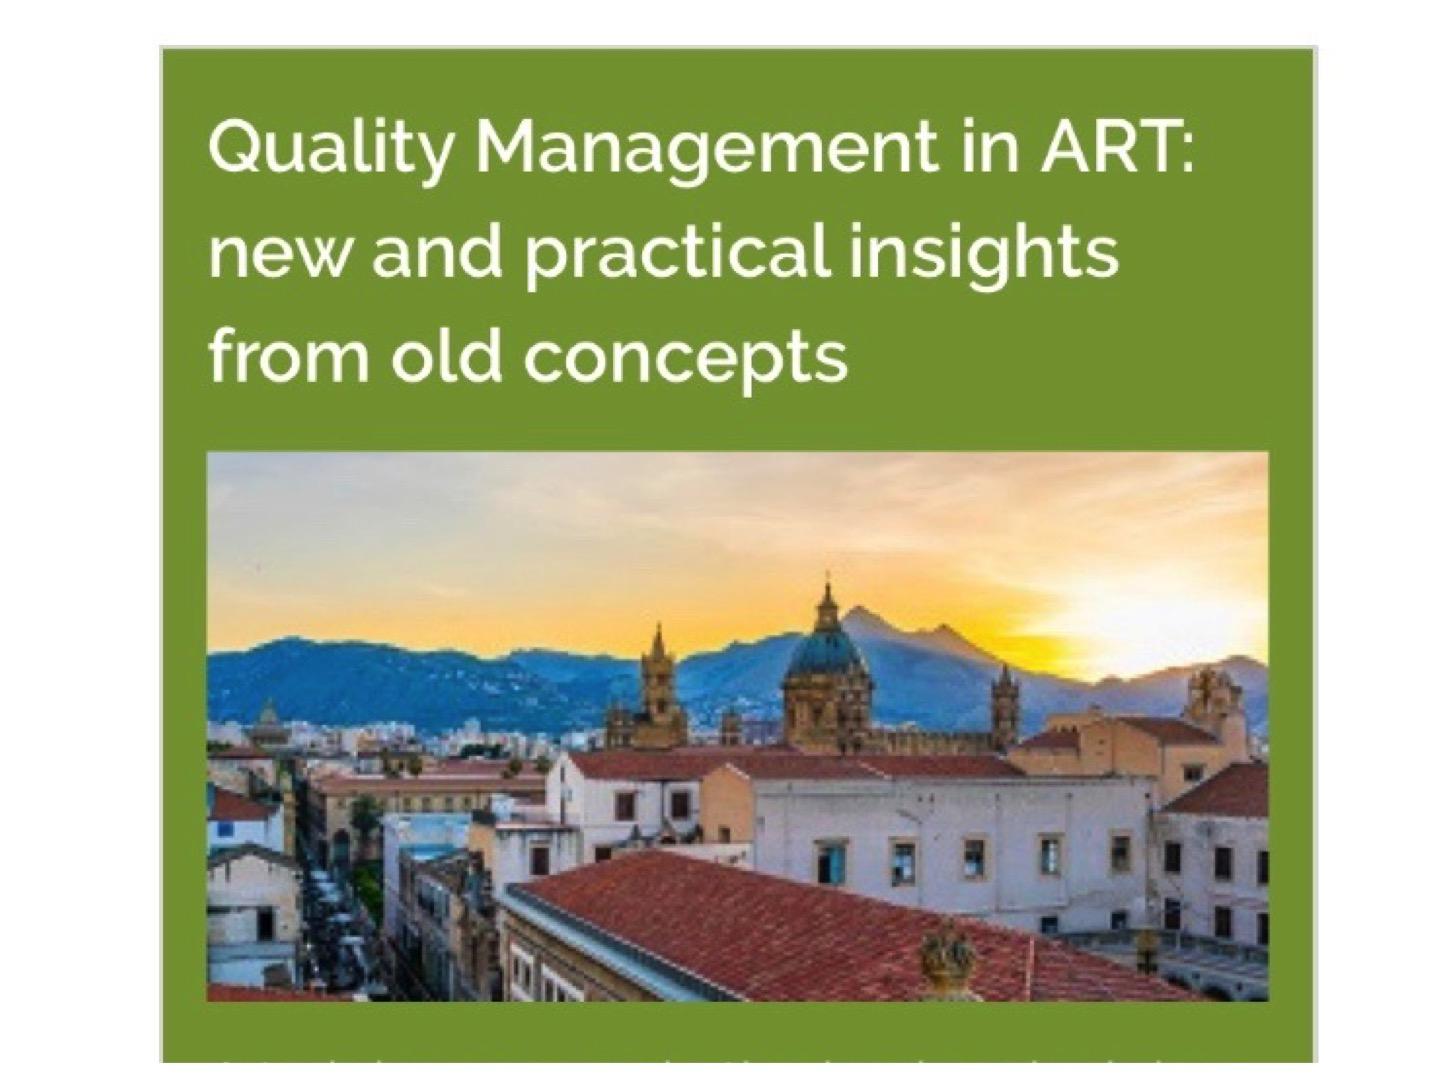 Quality Management ESHRE Palermo 2019 (01)